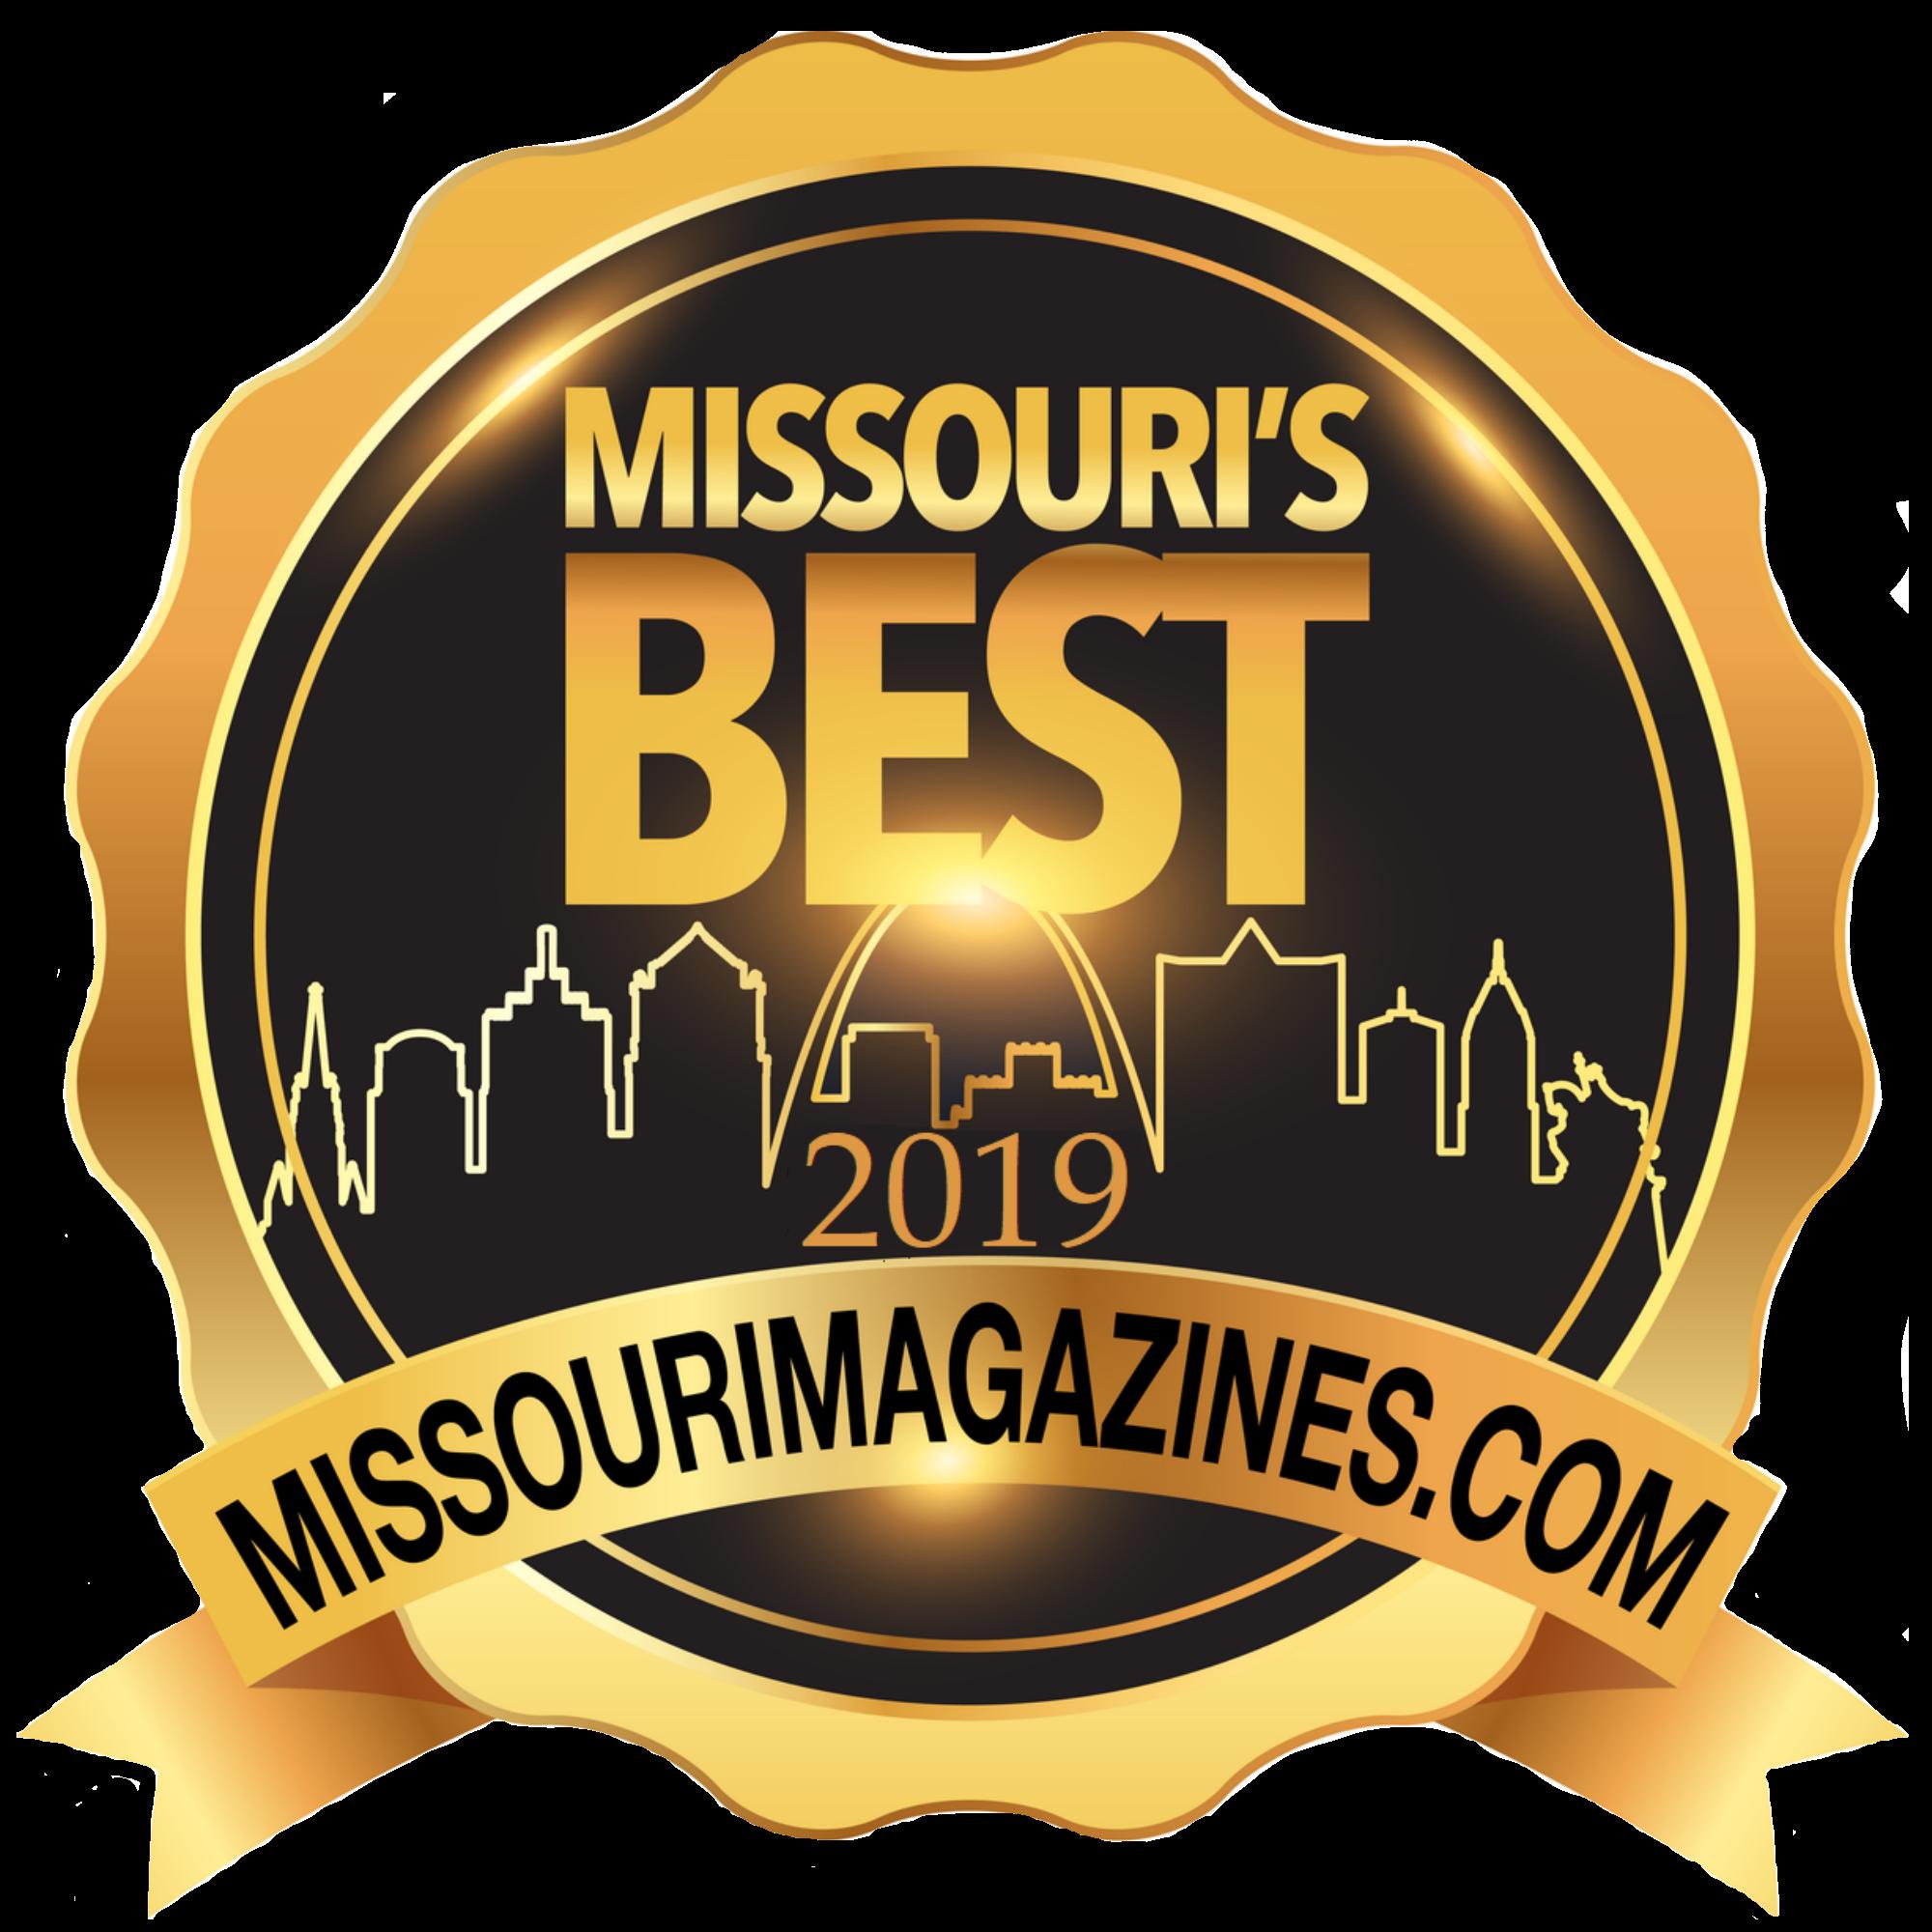 Big Country won Missouri's Best 2019